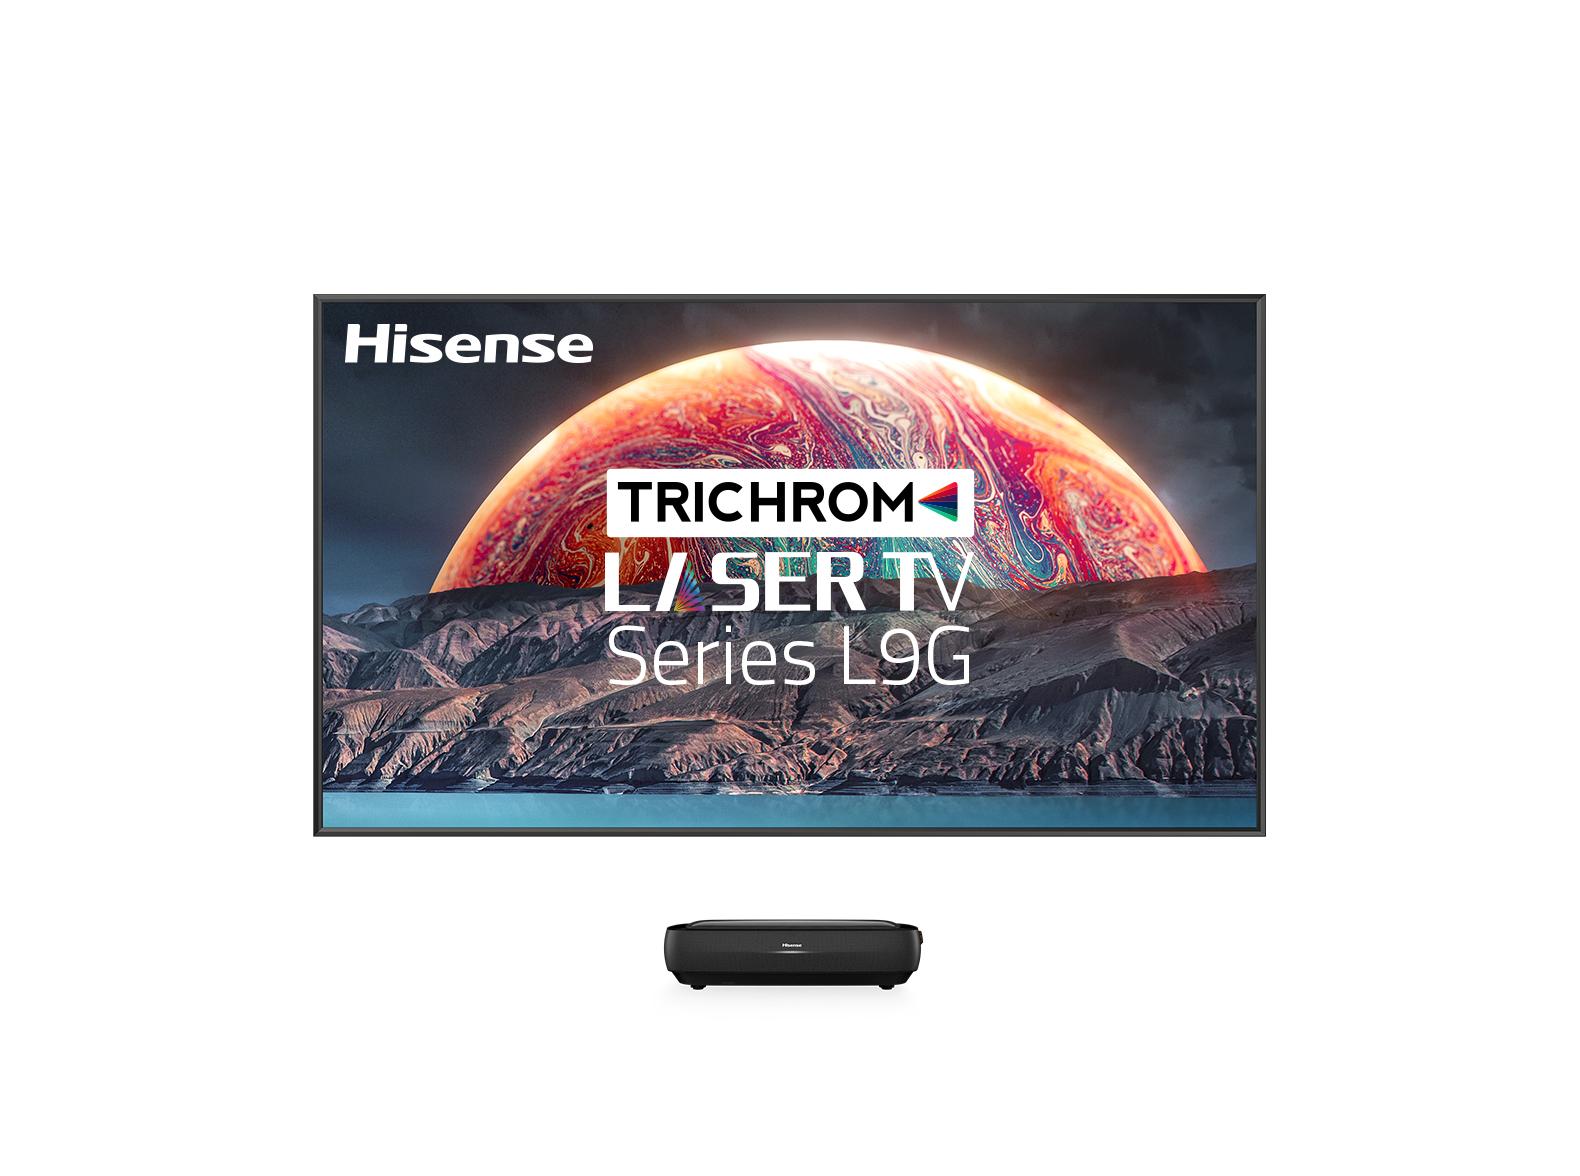 100″ TriChroma Laser TV Series L9G